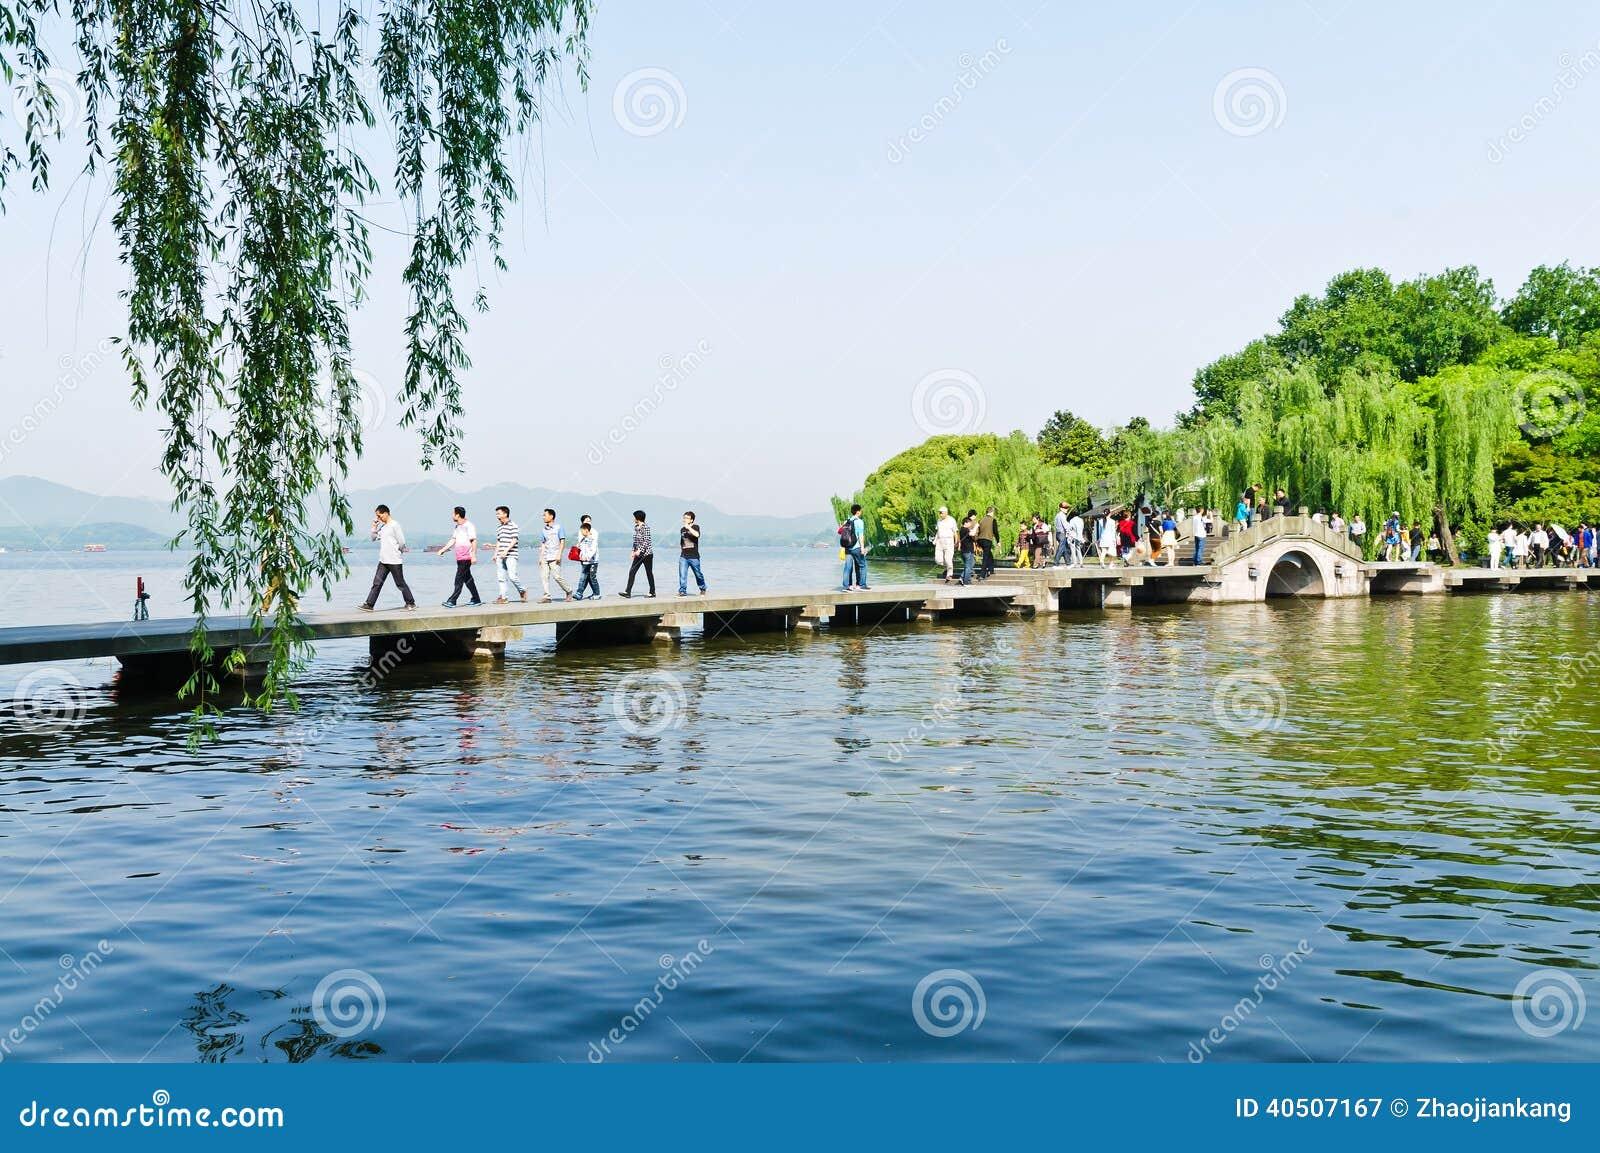 Hangzhou West Lake Scenery Editorial Photography  Image Of